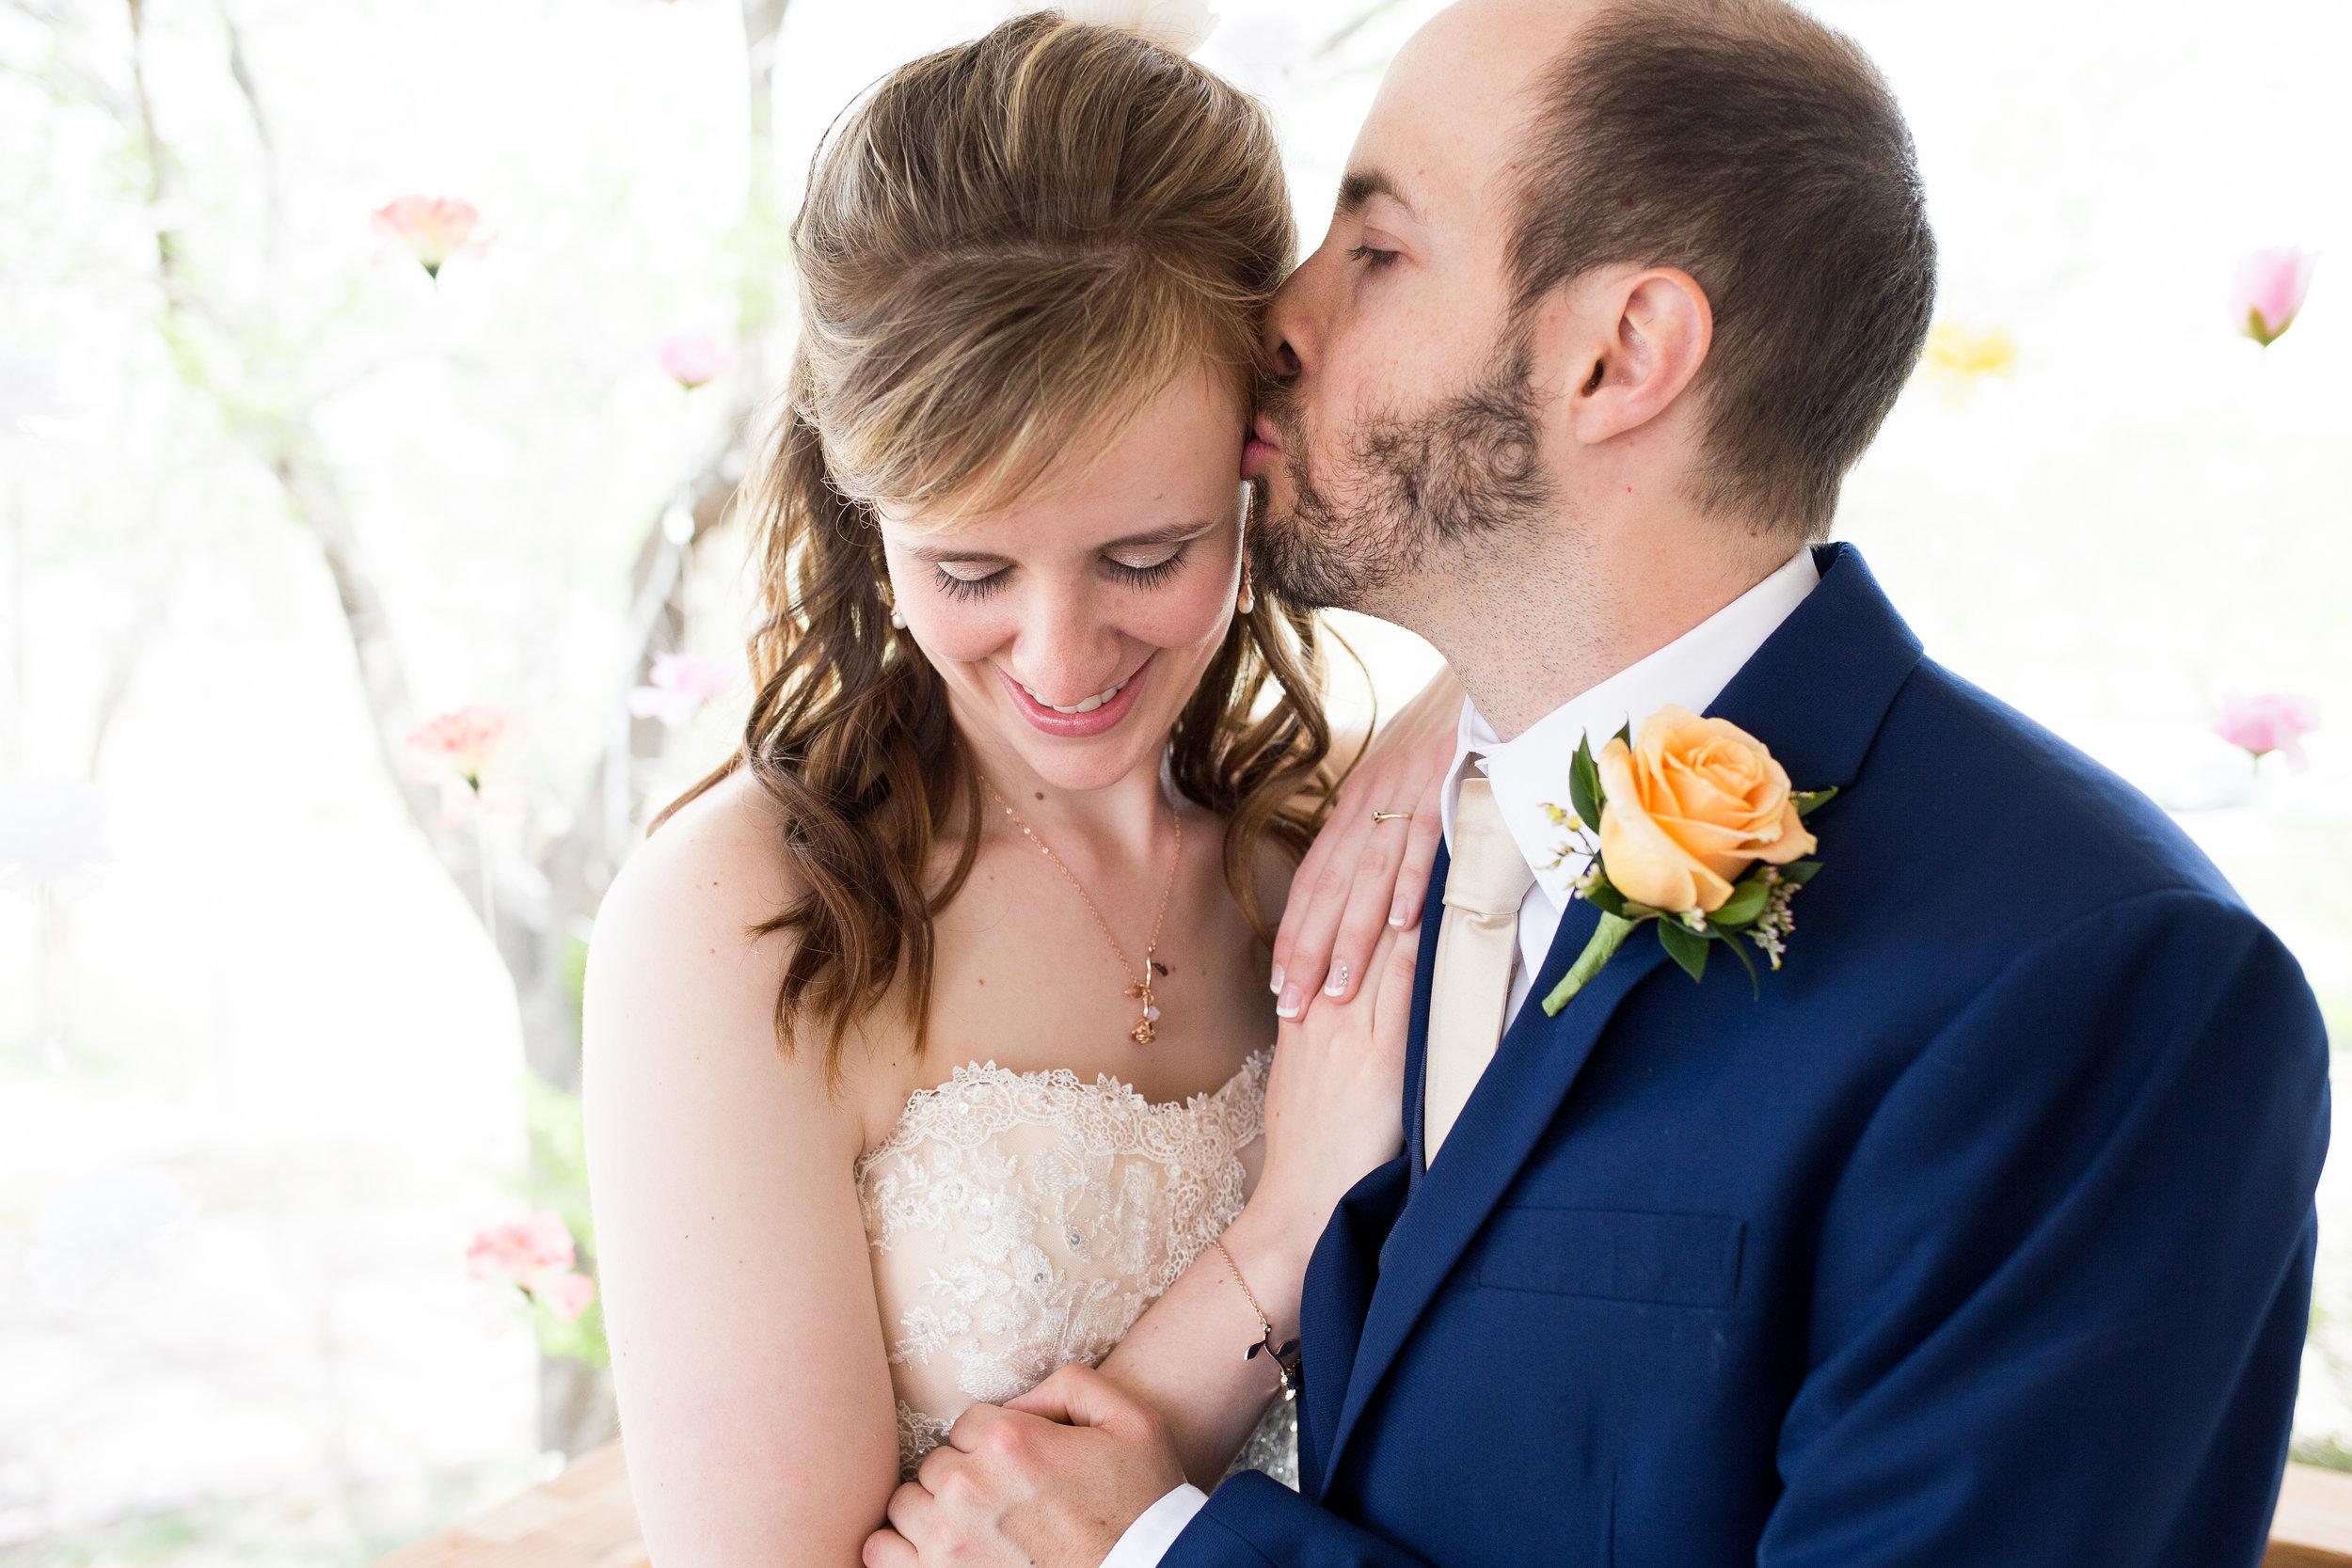 Colorado Springs Wedding Photography Spring wedding at Sasgecreek Community Bible Church in  Peyton,  CO